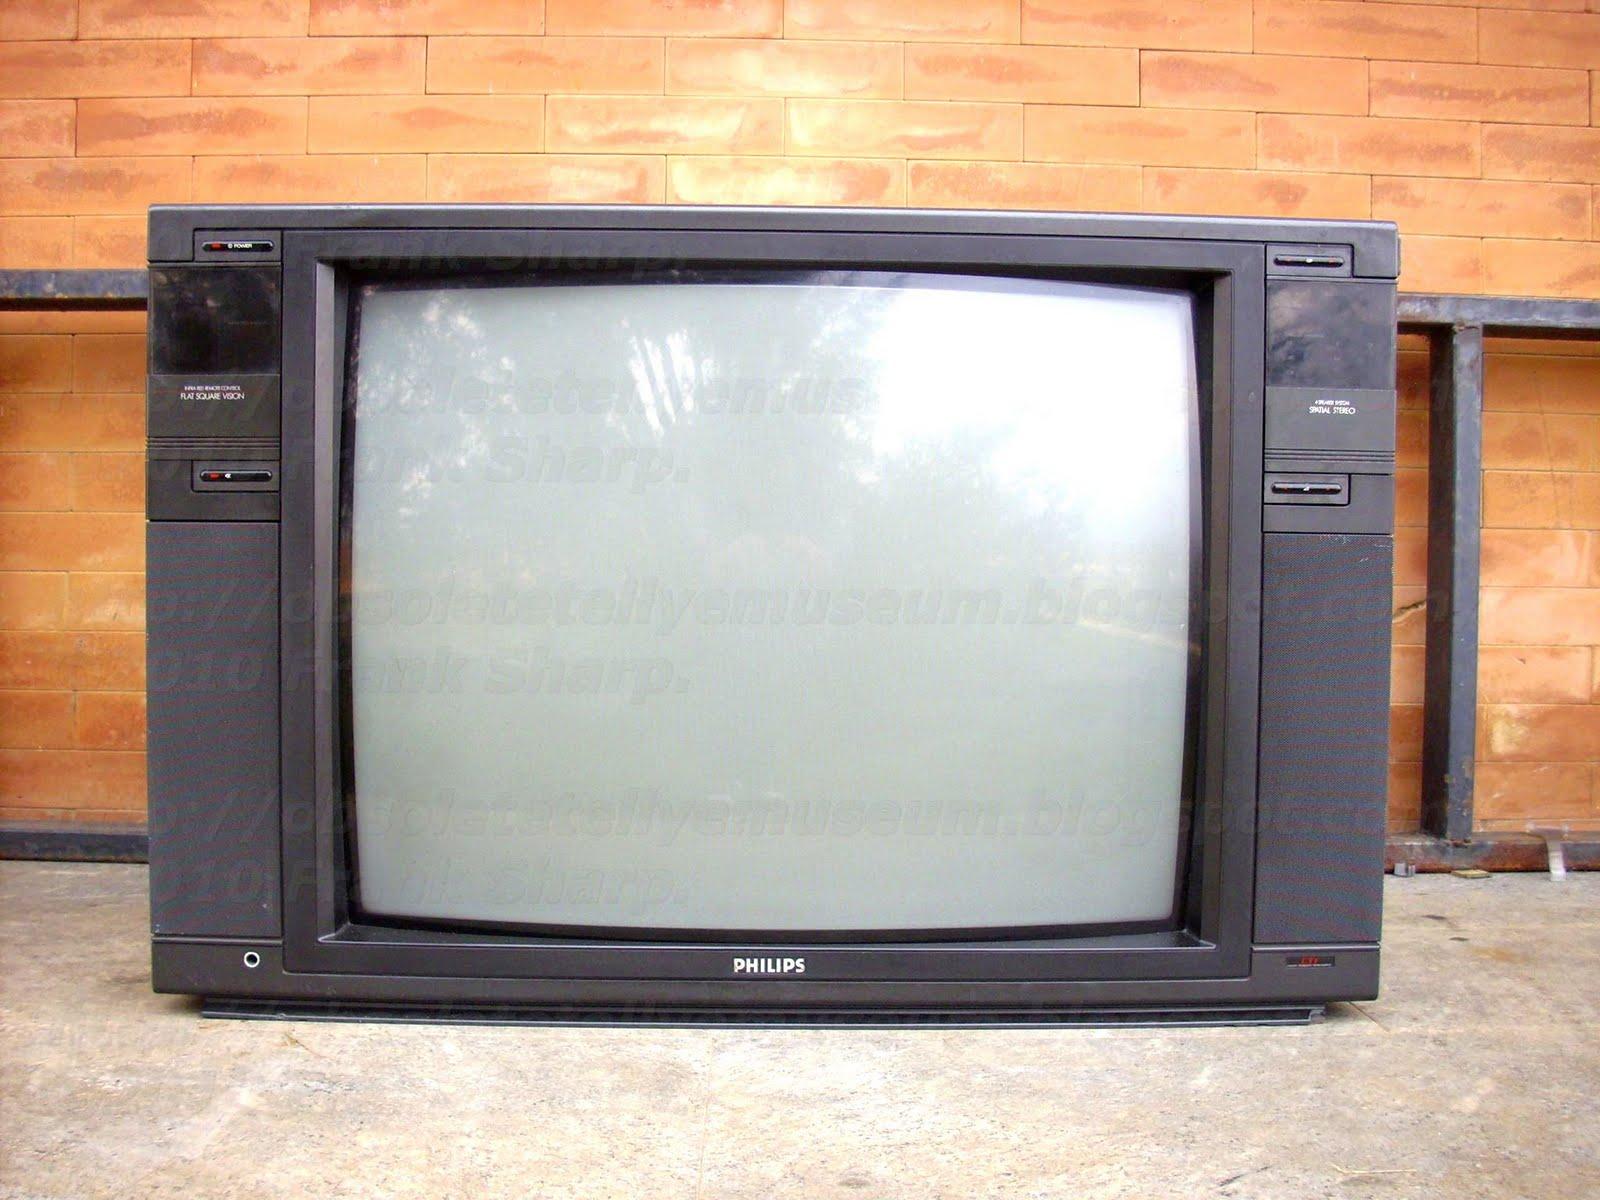 obsolete technology tellye philips 27ce4299 30r goya. Black Bedroom Furniture Sets. Home Design Ideas